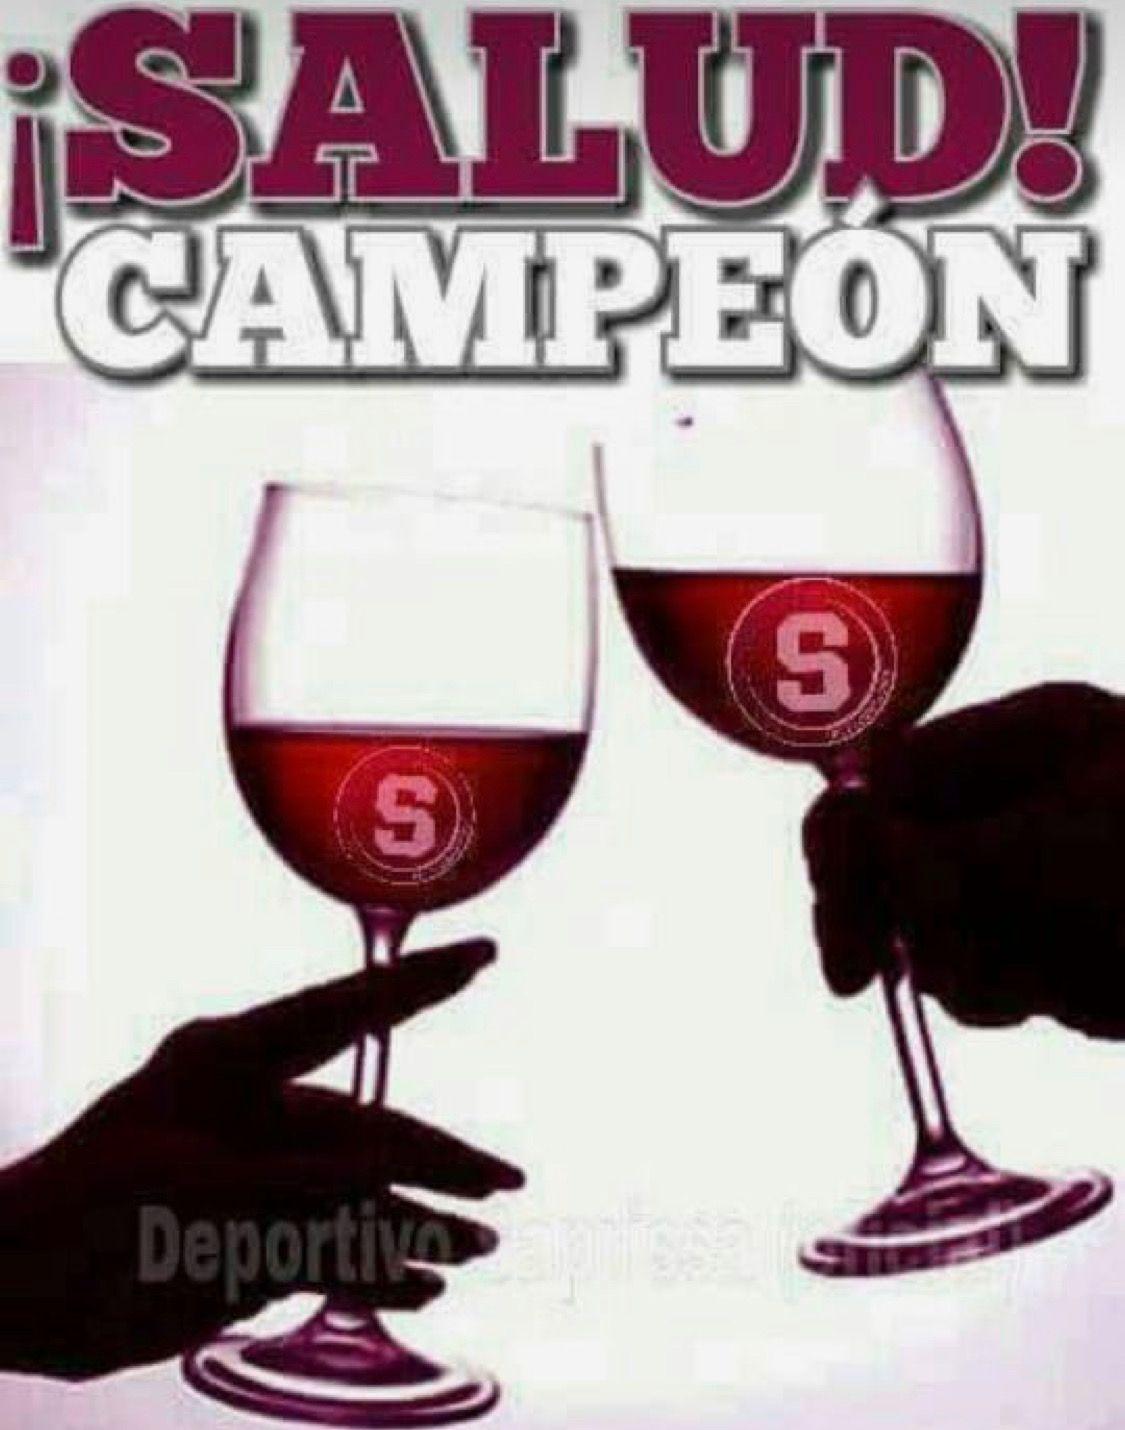 Pin By Vladimir Mora On Saprissa Sele Alcoholic Drinks Red Wine Wine Glass